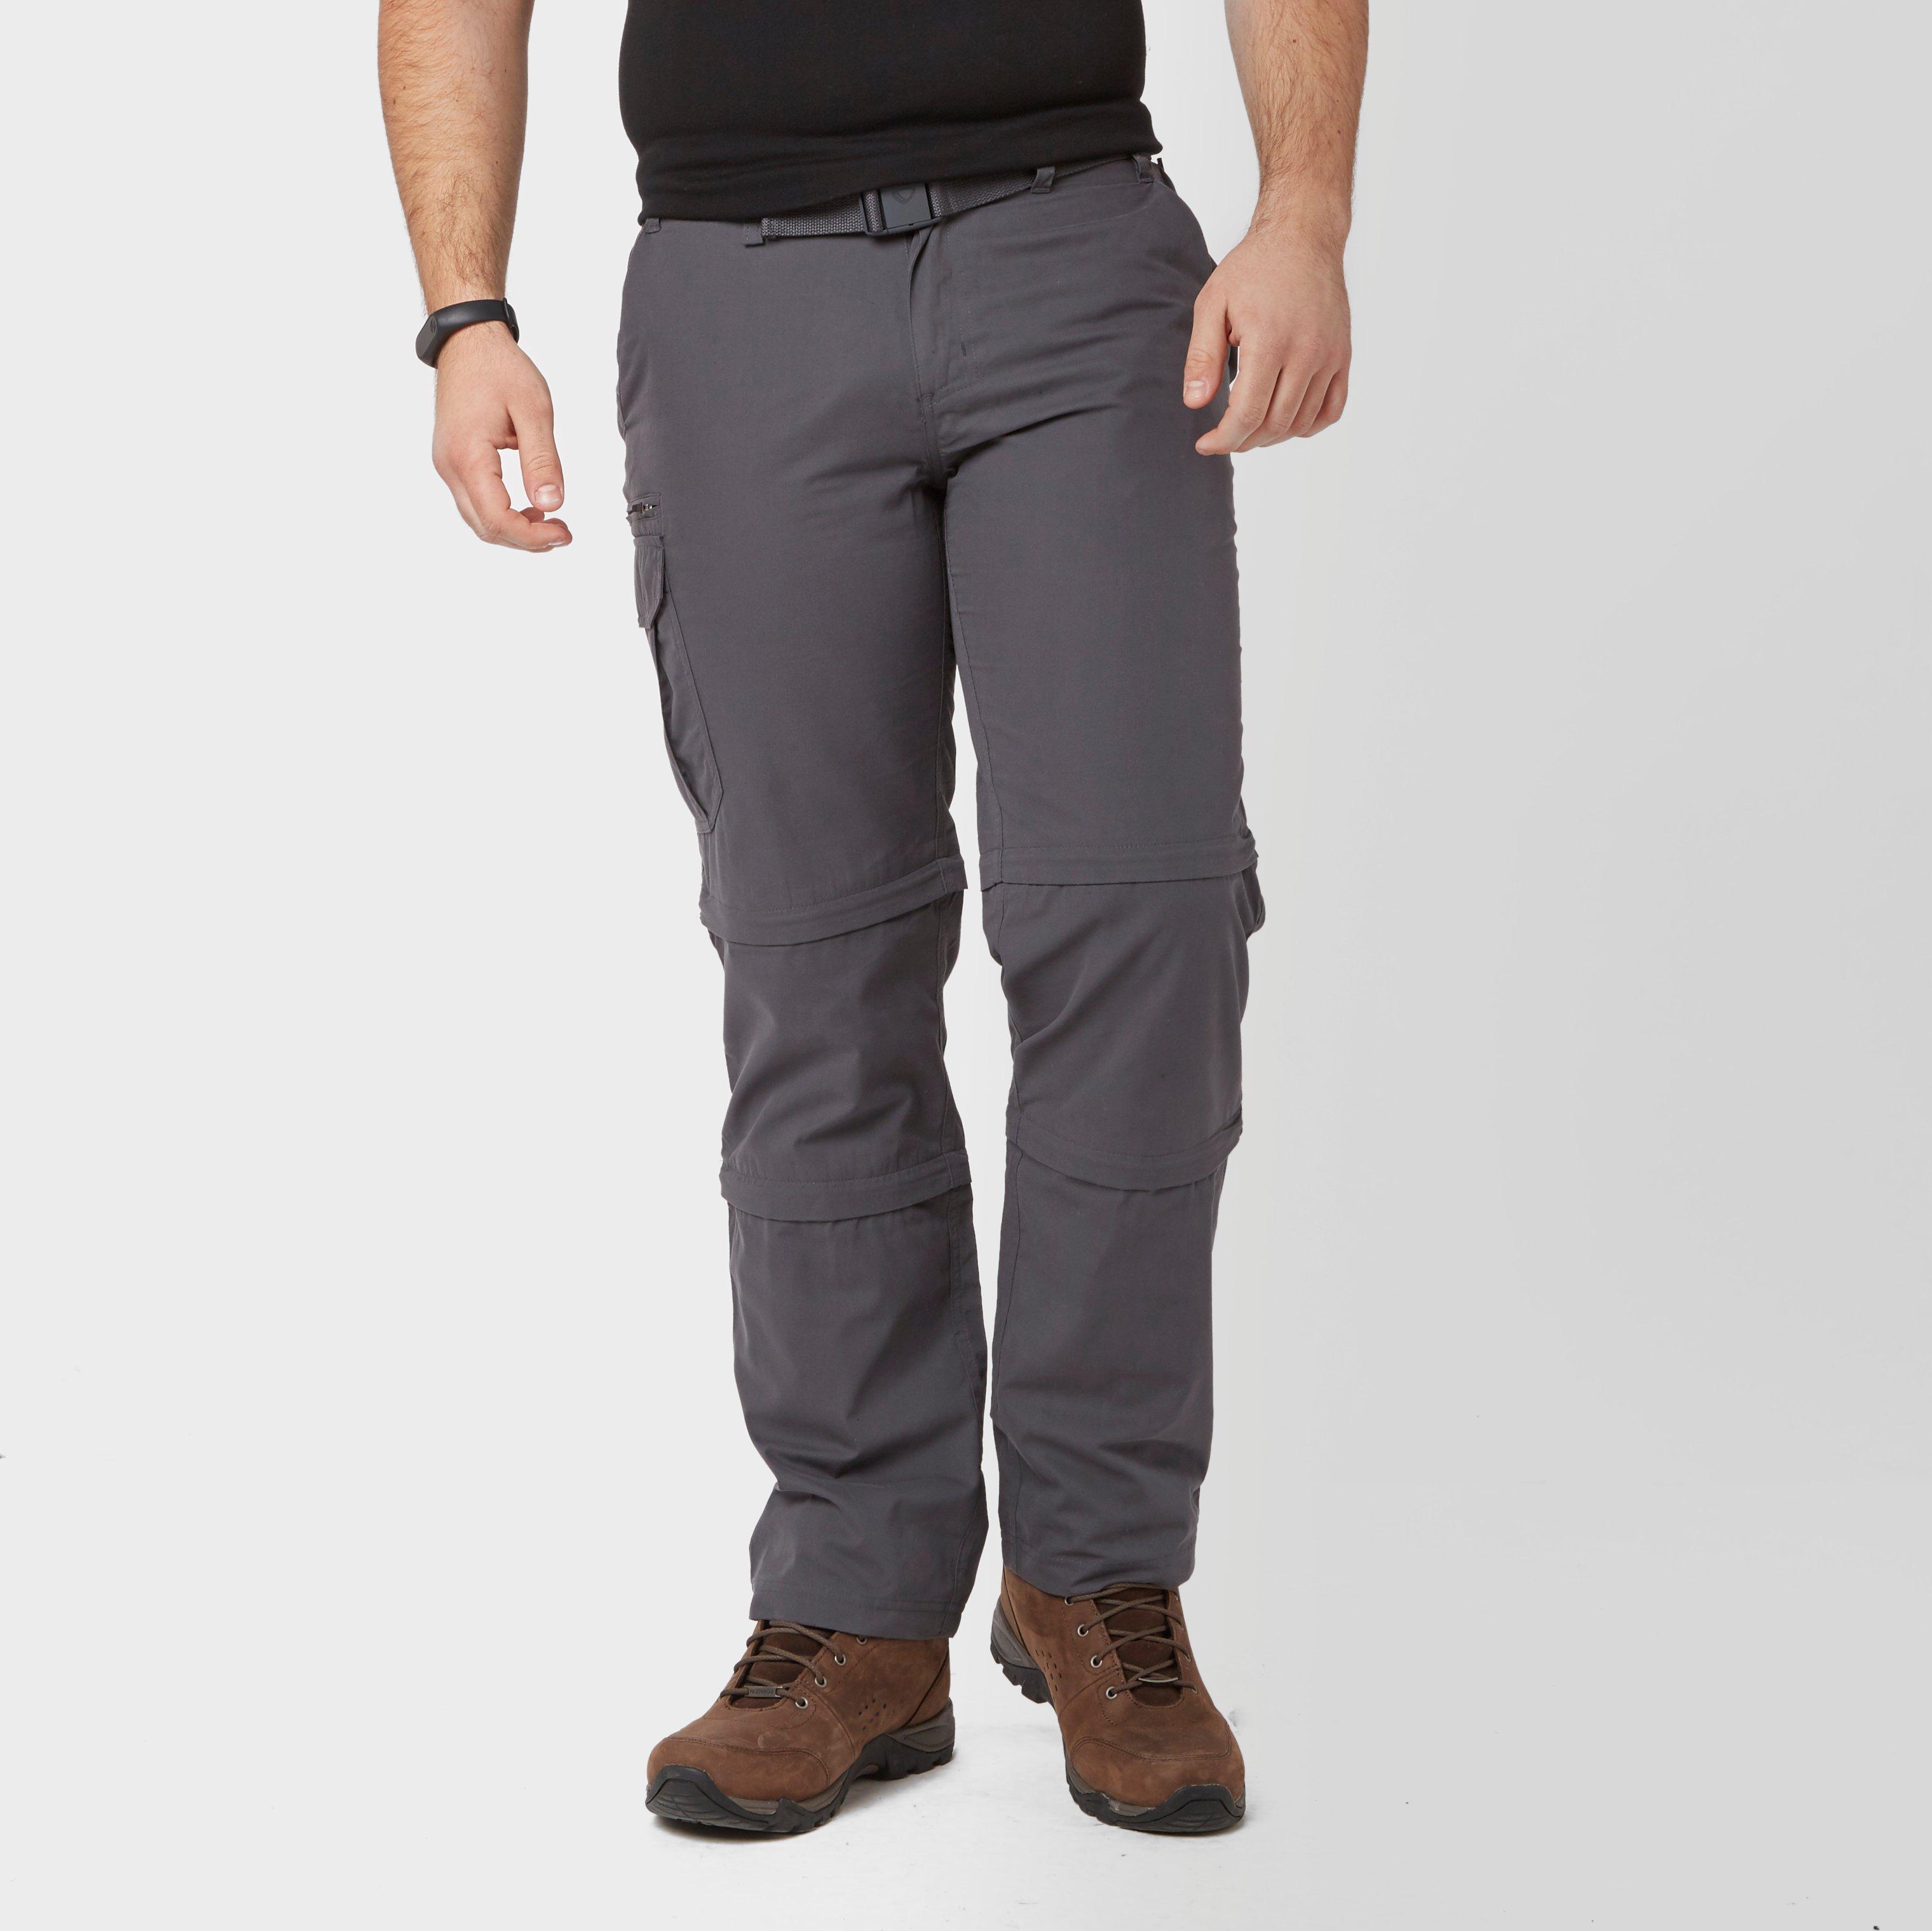 Brasher Brasher Mens Double Zip-Off Trousers - Grey, Grey